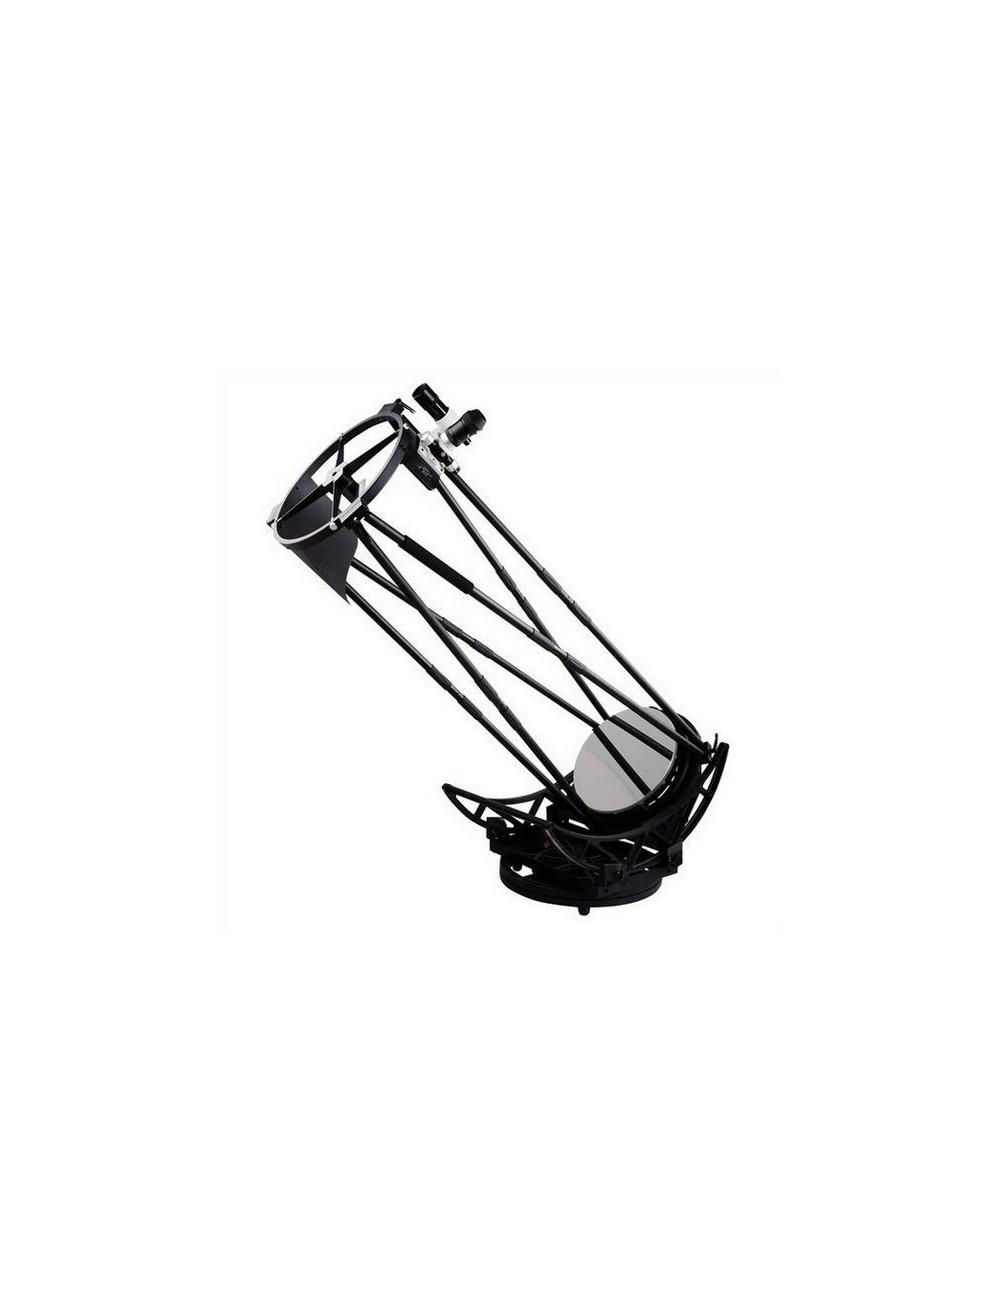 Télescope Dobson Sky-Watcher StarGate Astrolitech 458/1900